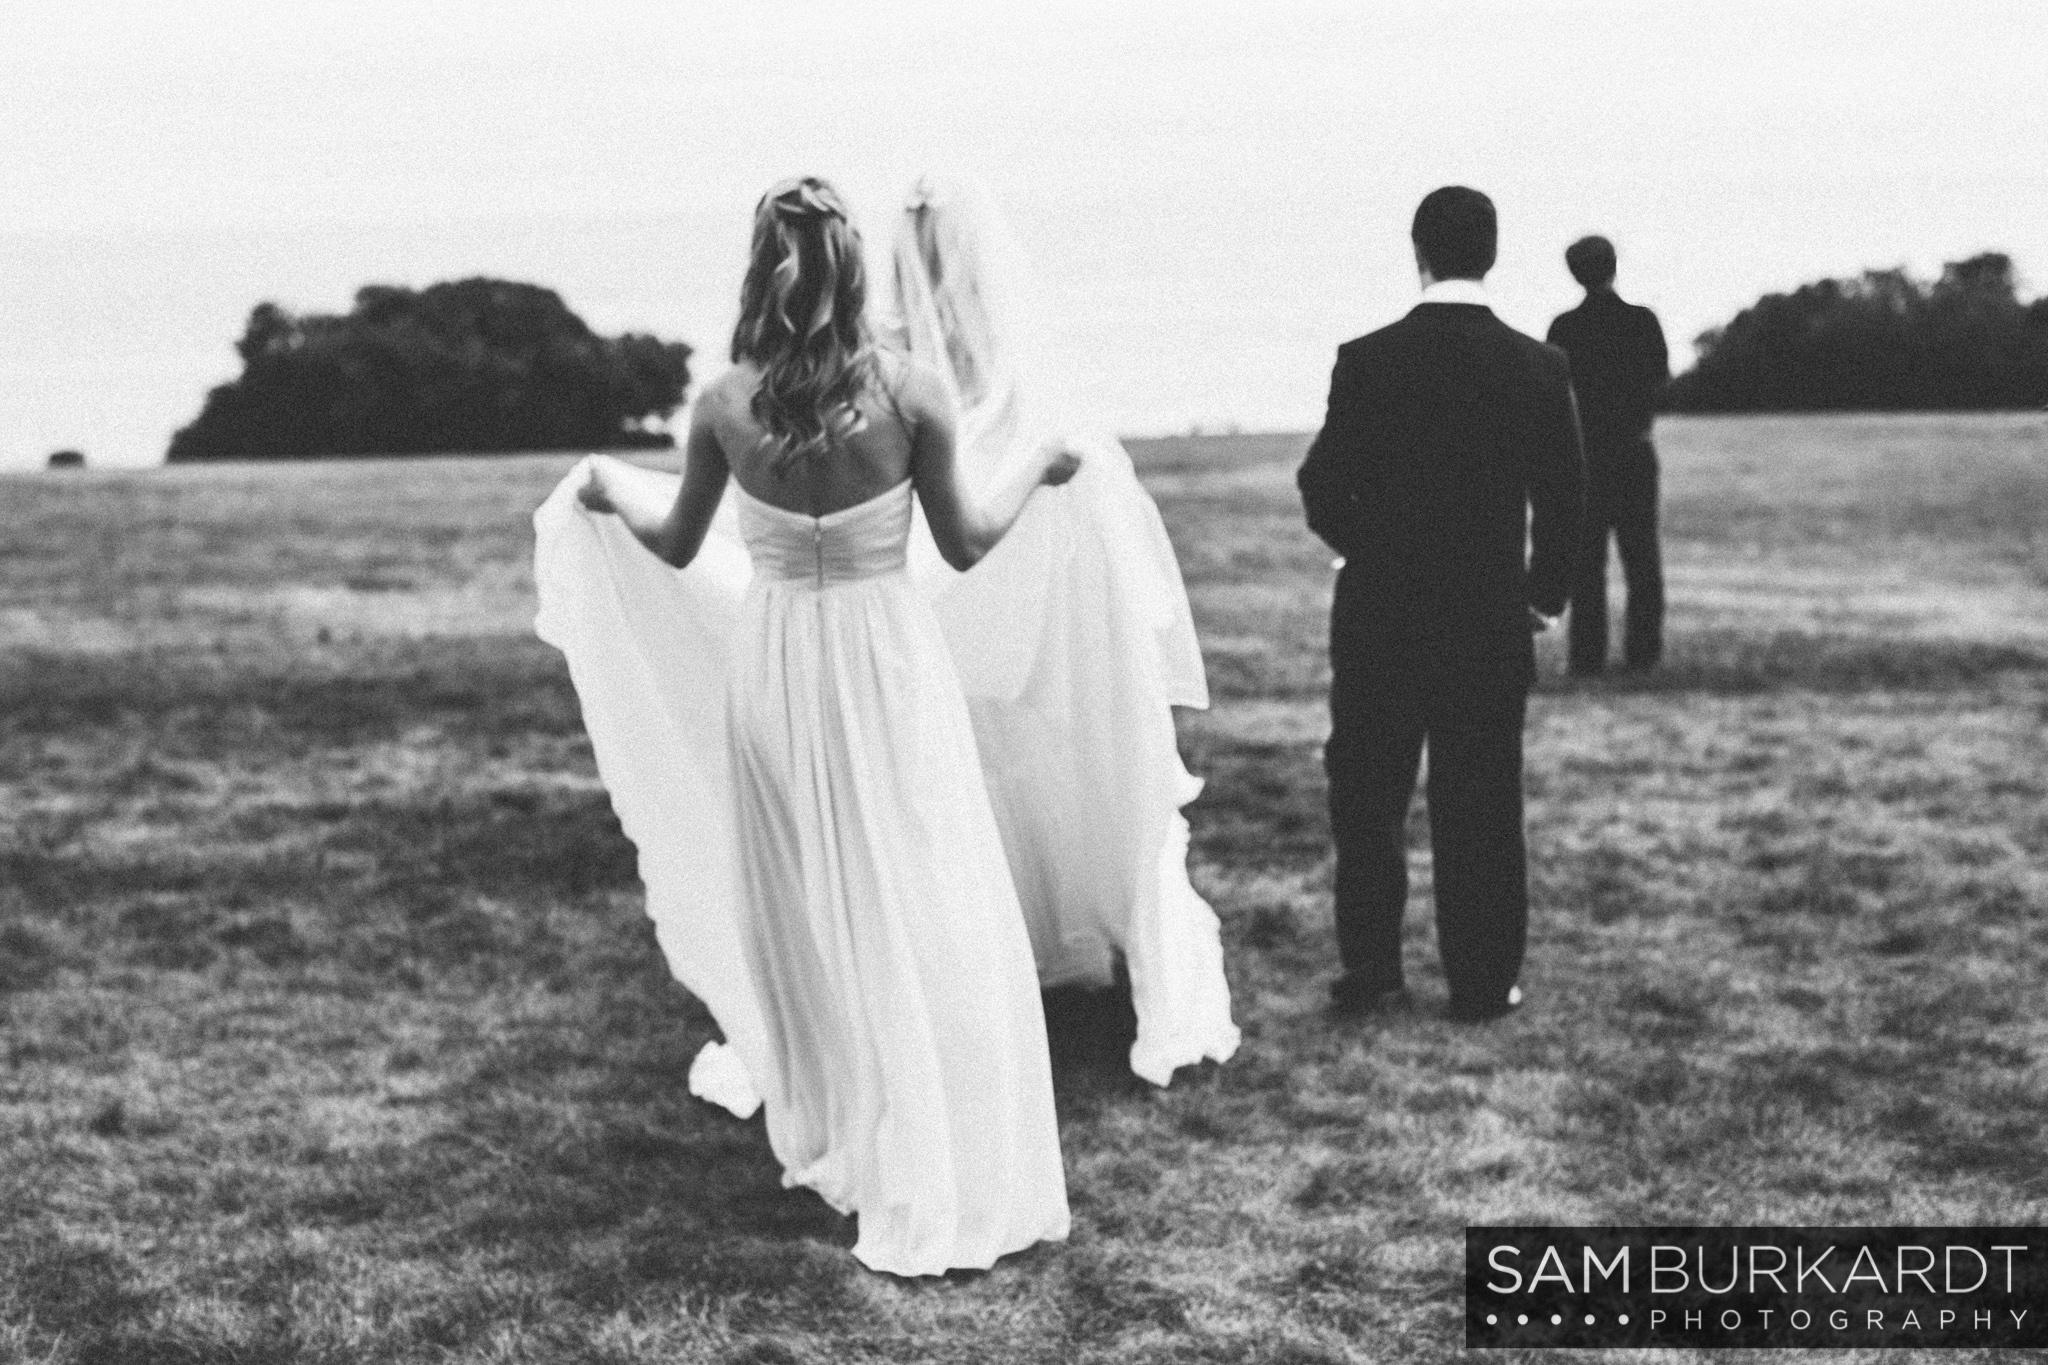 samburkardt_platz_moore_connecticut_branford_house_long_island_sound_august_photography_wedding_glamour_pink_0031.jpg